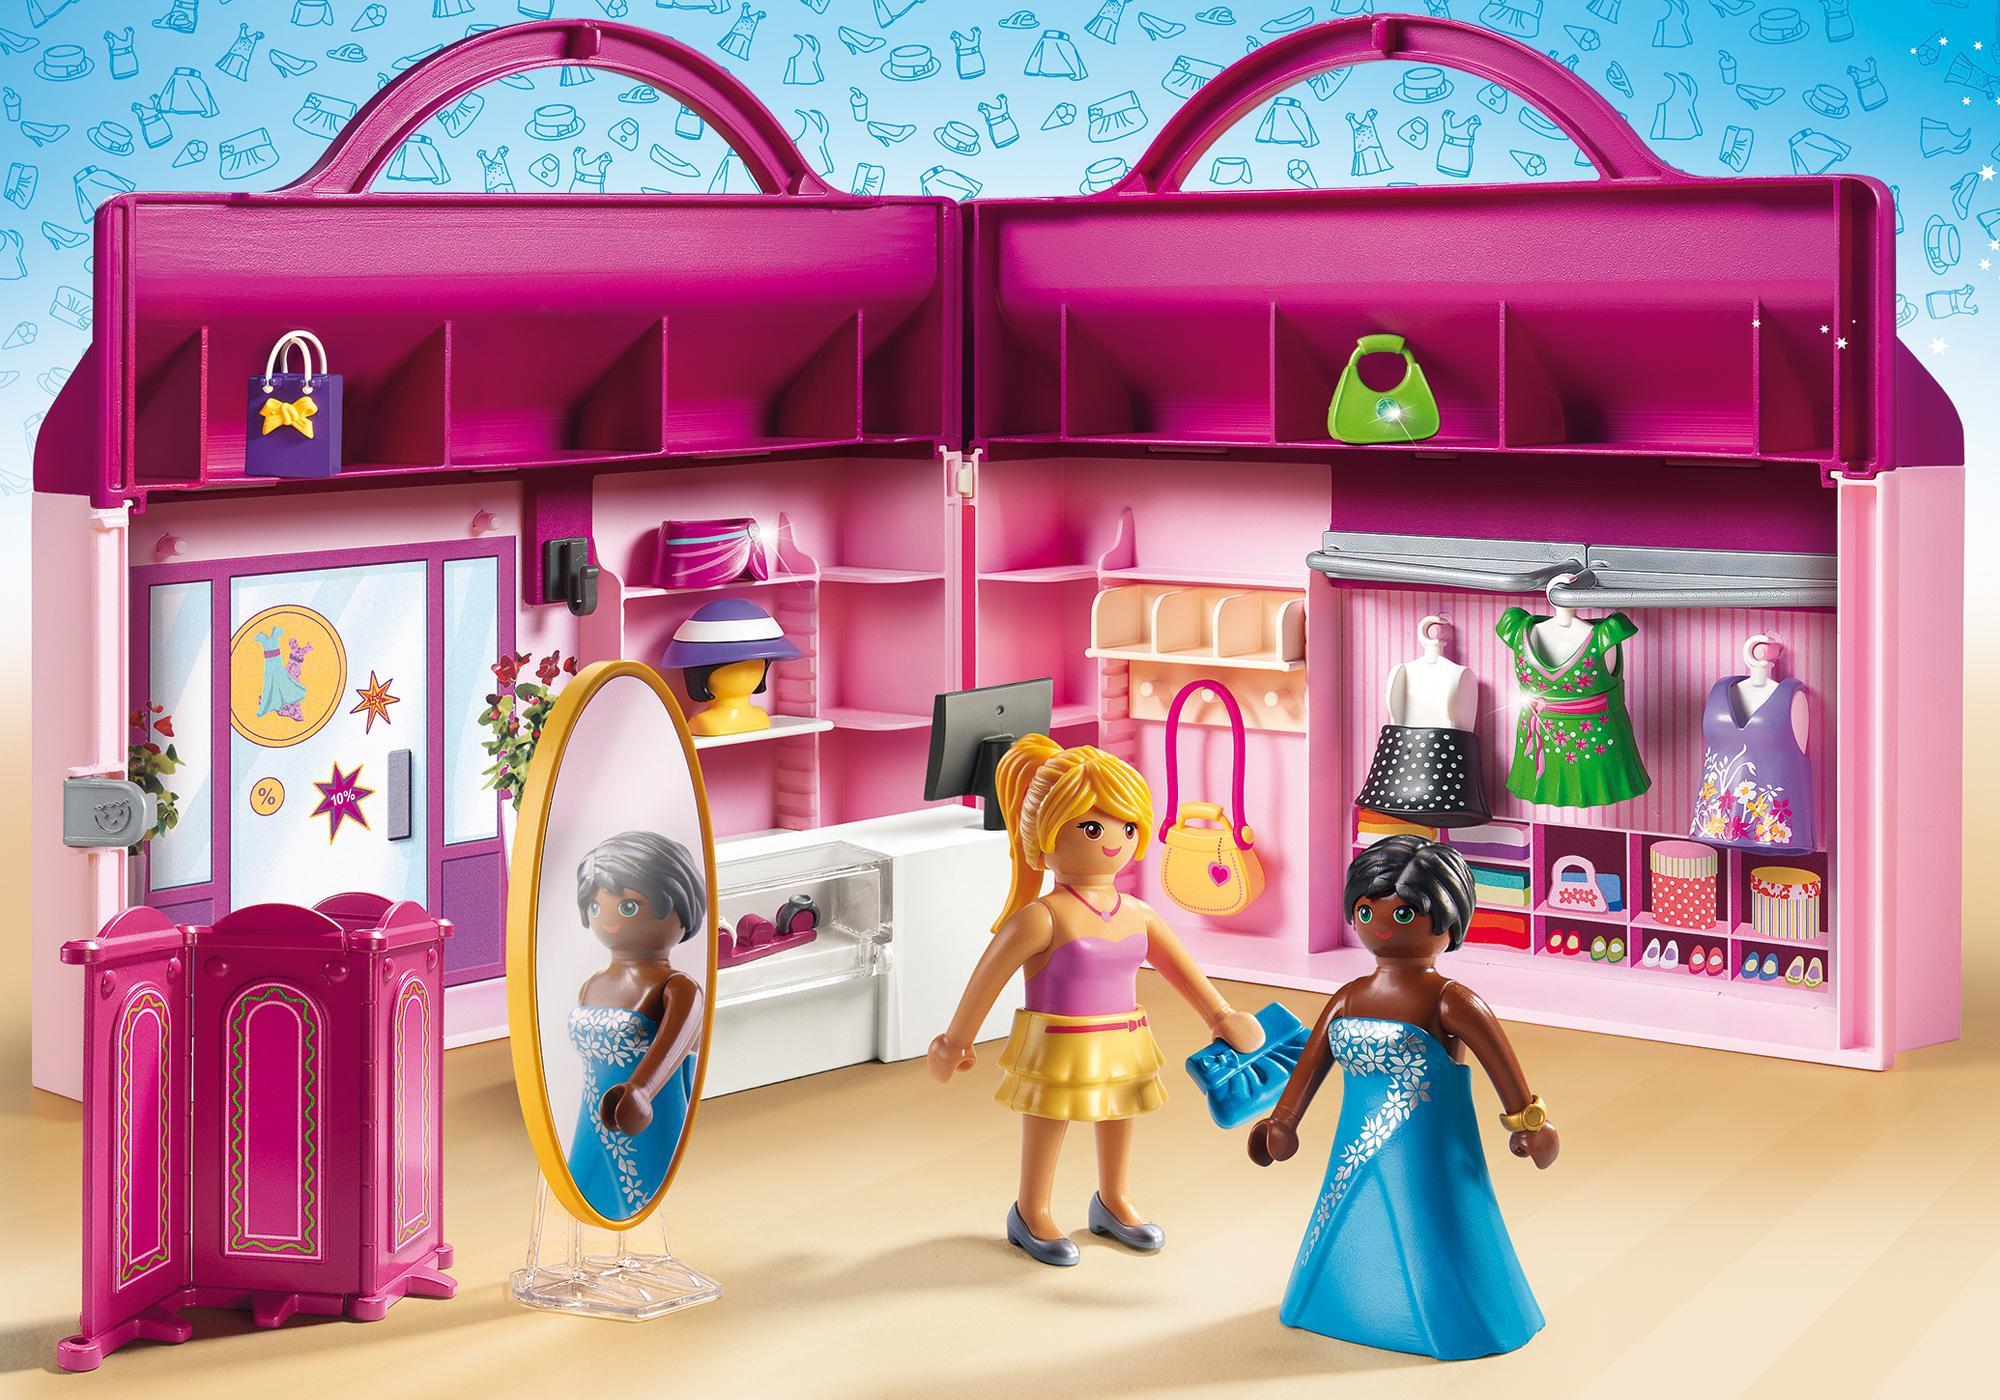 http://media.playmobil.com/i/playmobil/6862_product_detail/Take Along Fashion Boutique